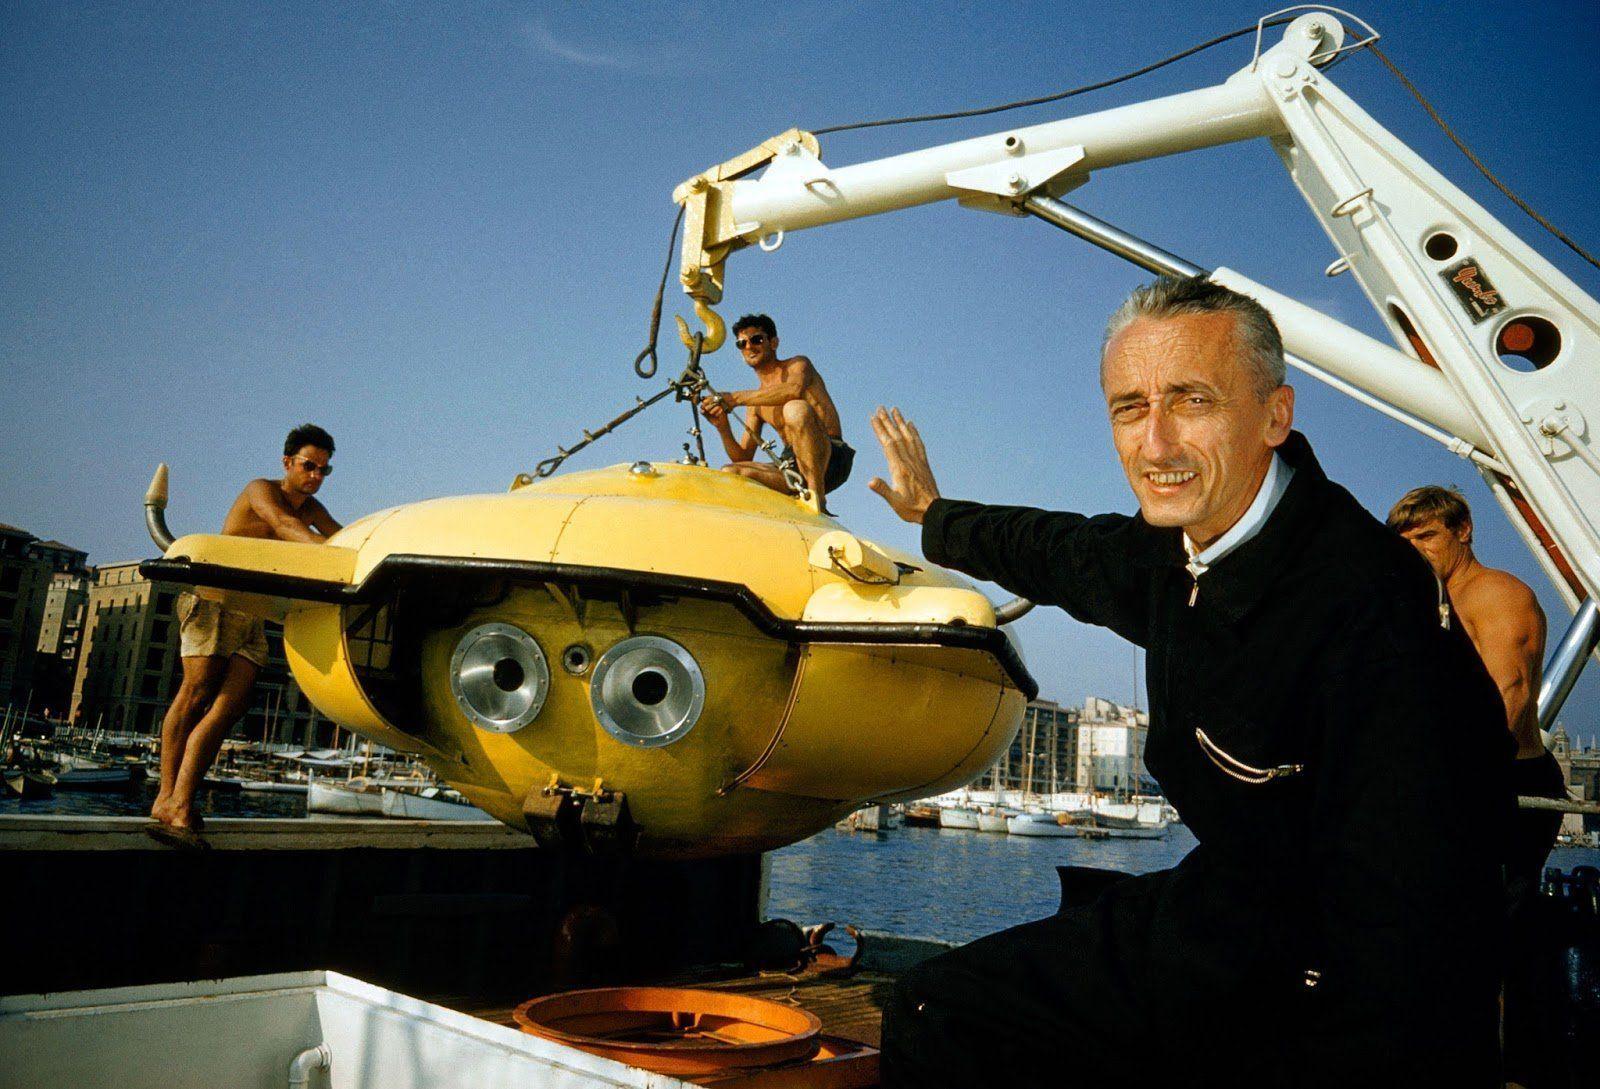 natgeo_cousteau_jacques_submersible.jpg